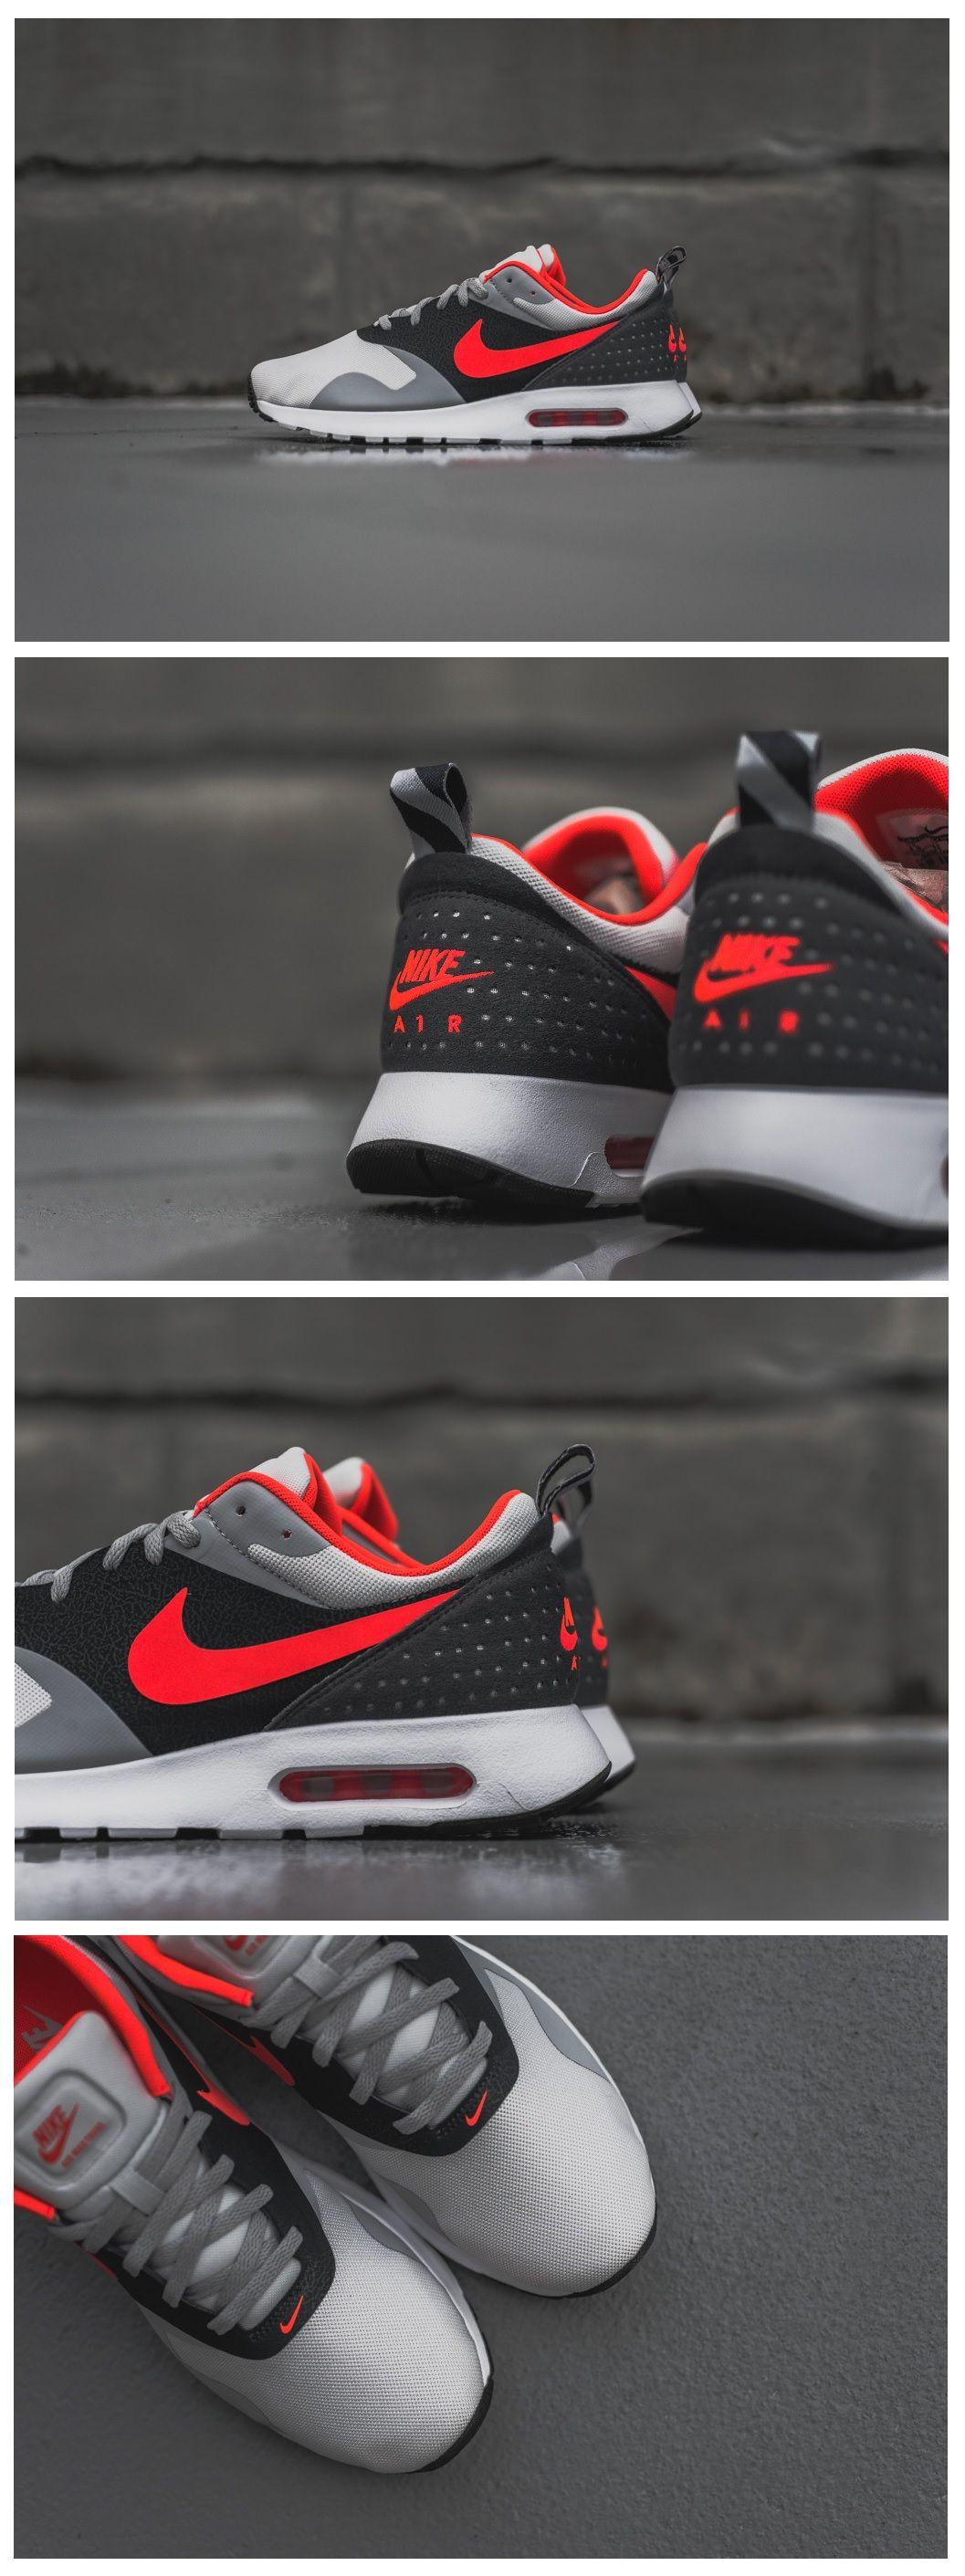 competitive price bd5b2 78efa Nike Air Max Tavas  Bright Crimson. Wish we had these here